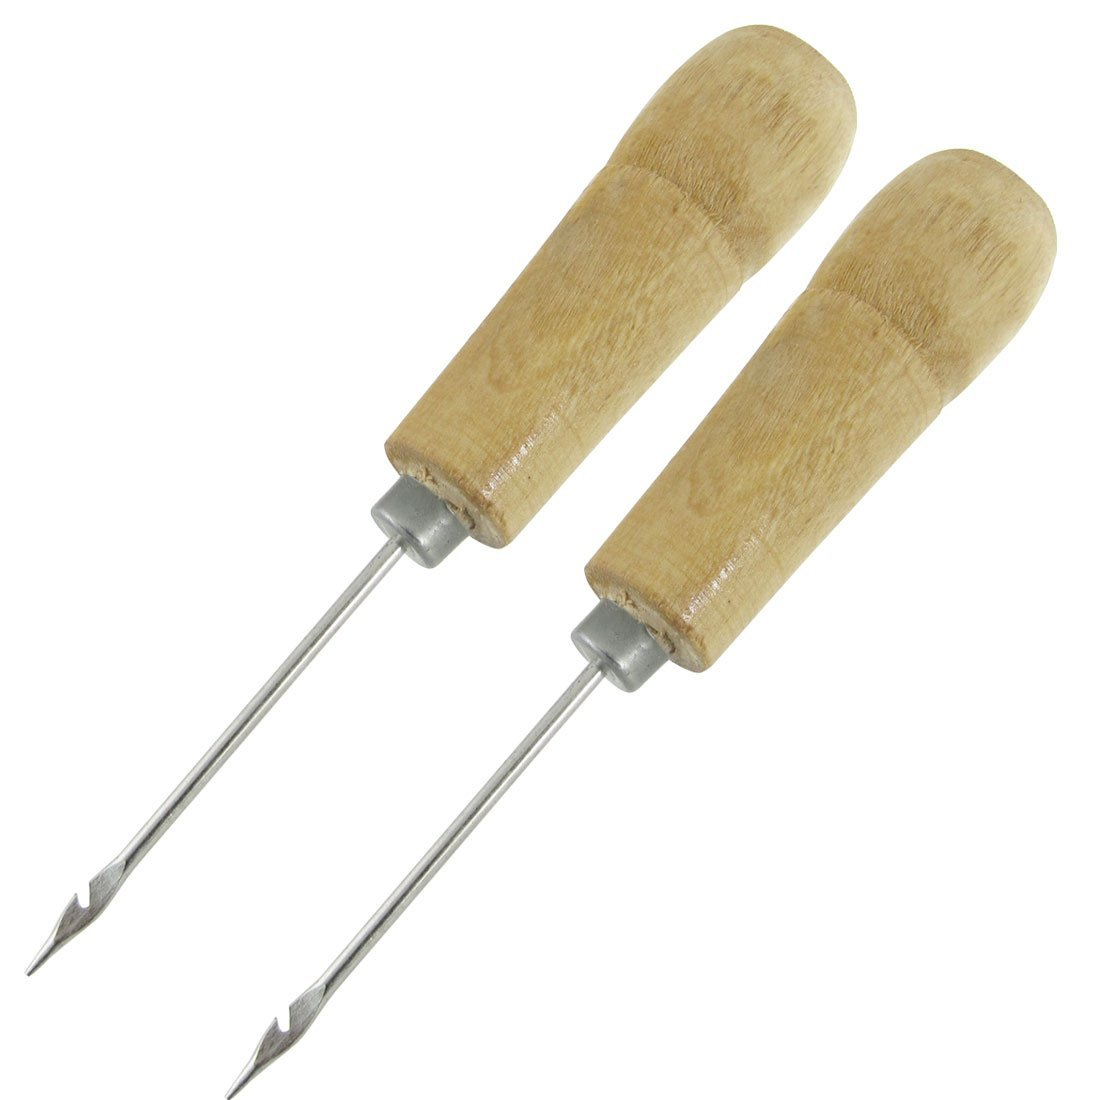 Nrpfell 2 Pcs Wooden Handle Sewing Awl Speedy Hand needleer